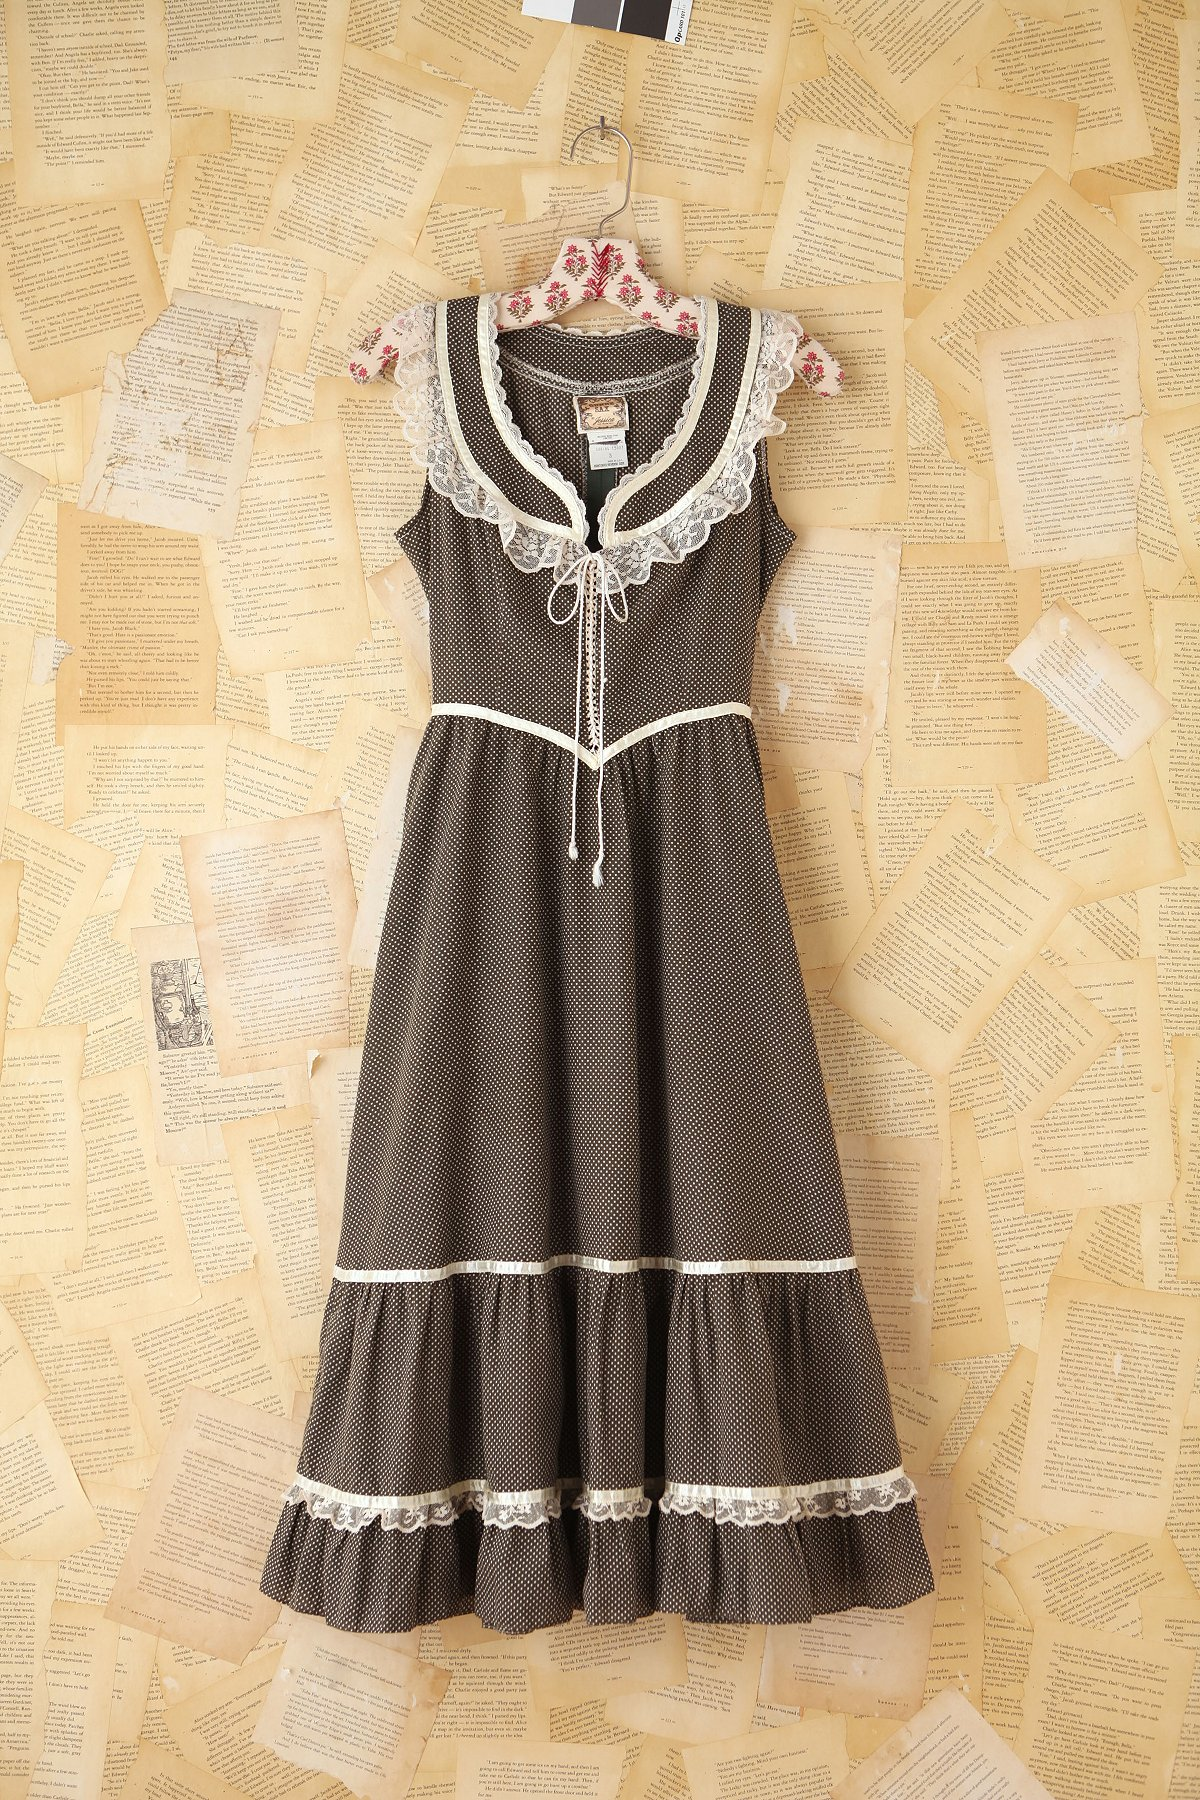 Vintage Dot and Lace Dress